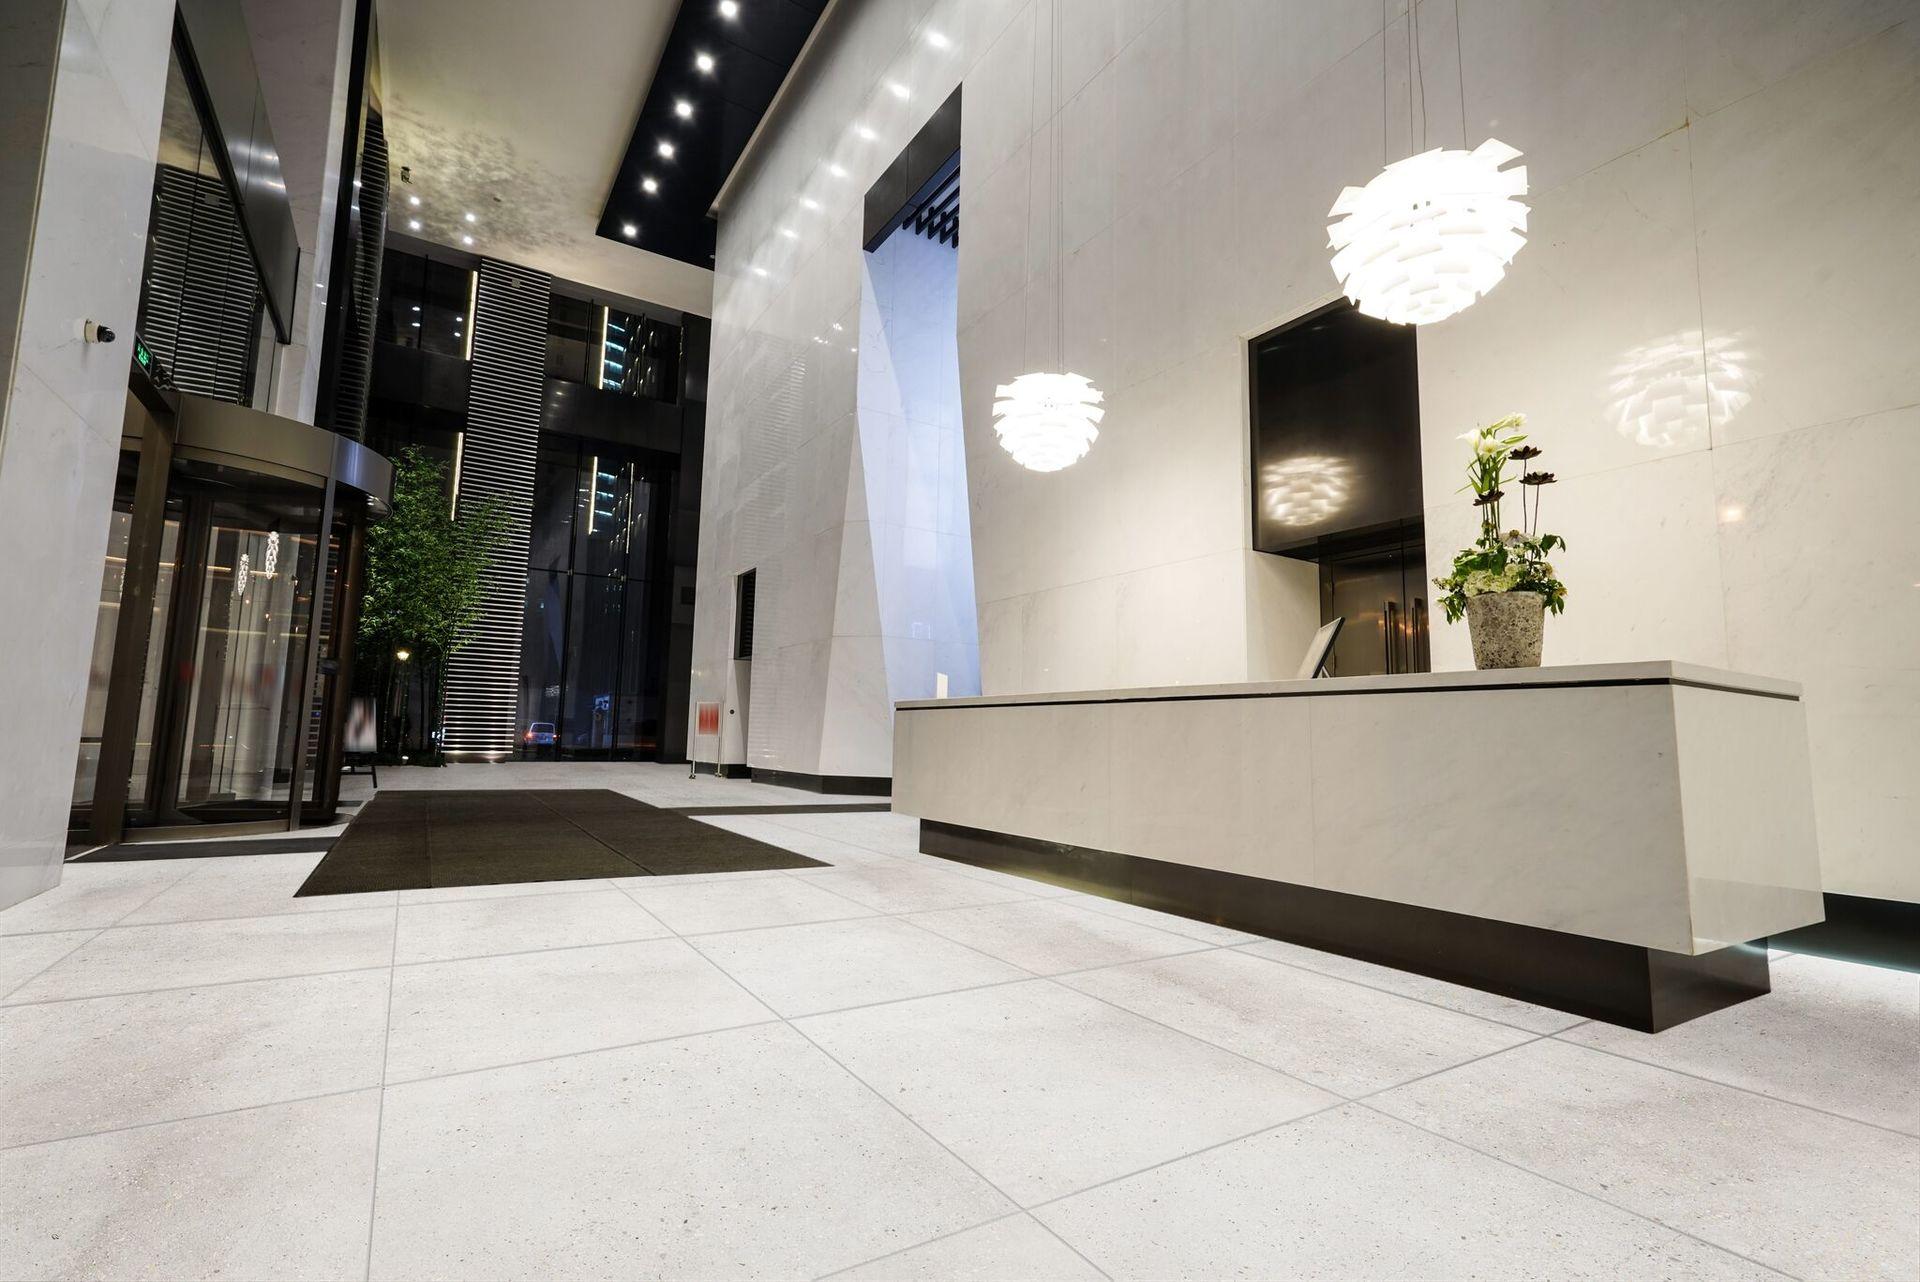 Indoor outdoor tile cairns marlin ceramic tiles slide title dailygadgetfo Images